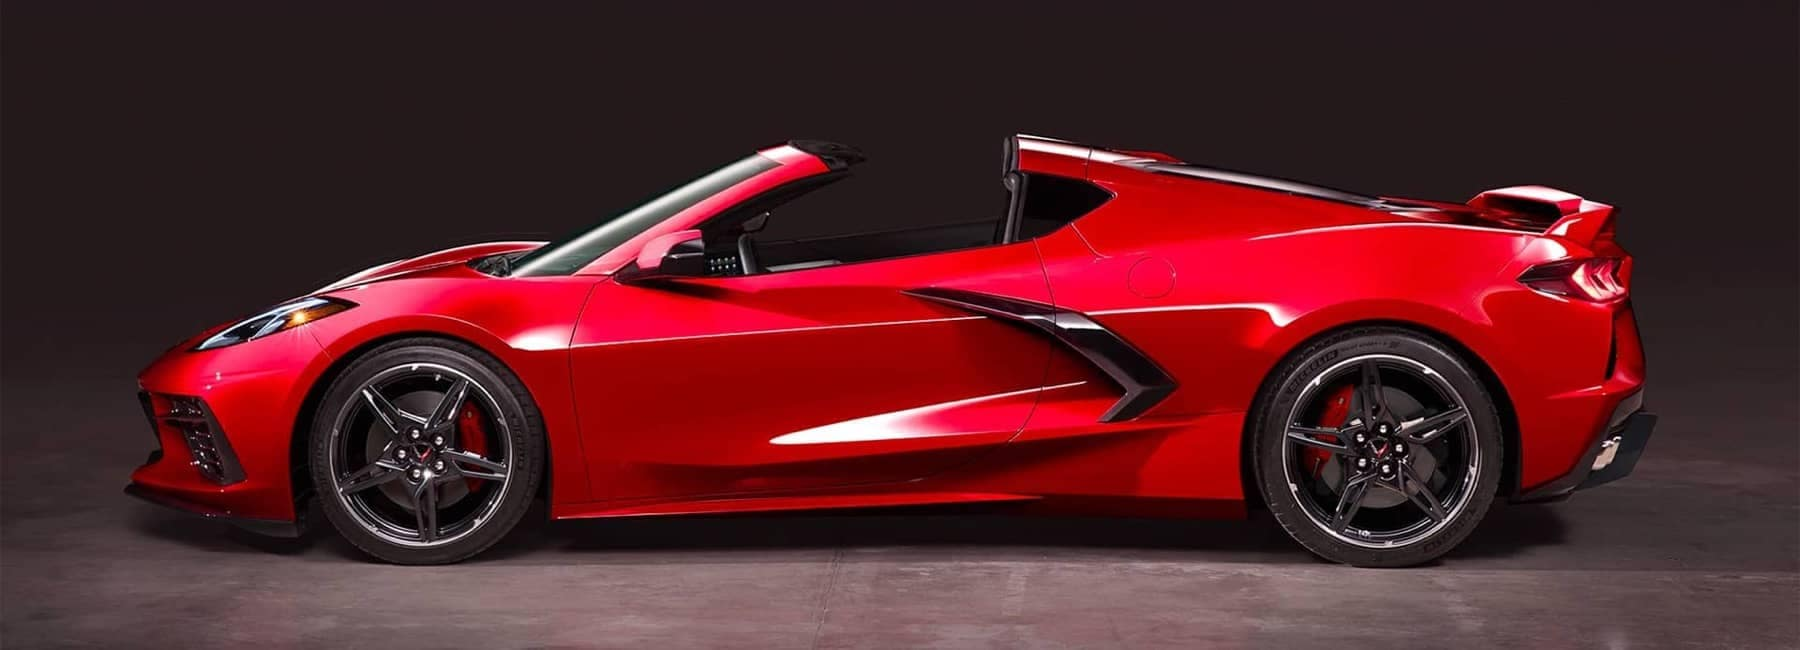 2020 Chevrolet Corvette Mid-Engine Sports Car Convertible profile view